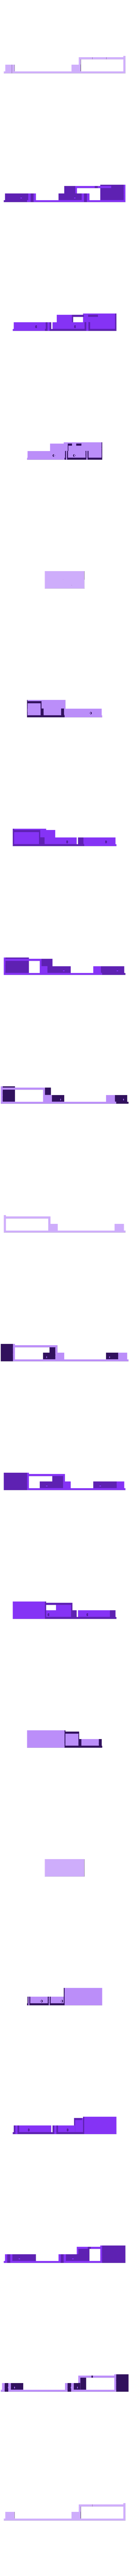 xpi_fan#r8.stl Download STL file Raspberry Pi 4 case XPI • 3D printing template, Steenberg